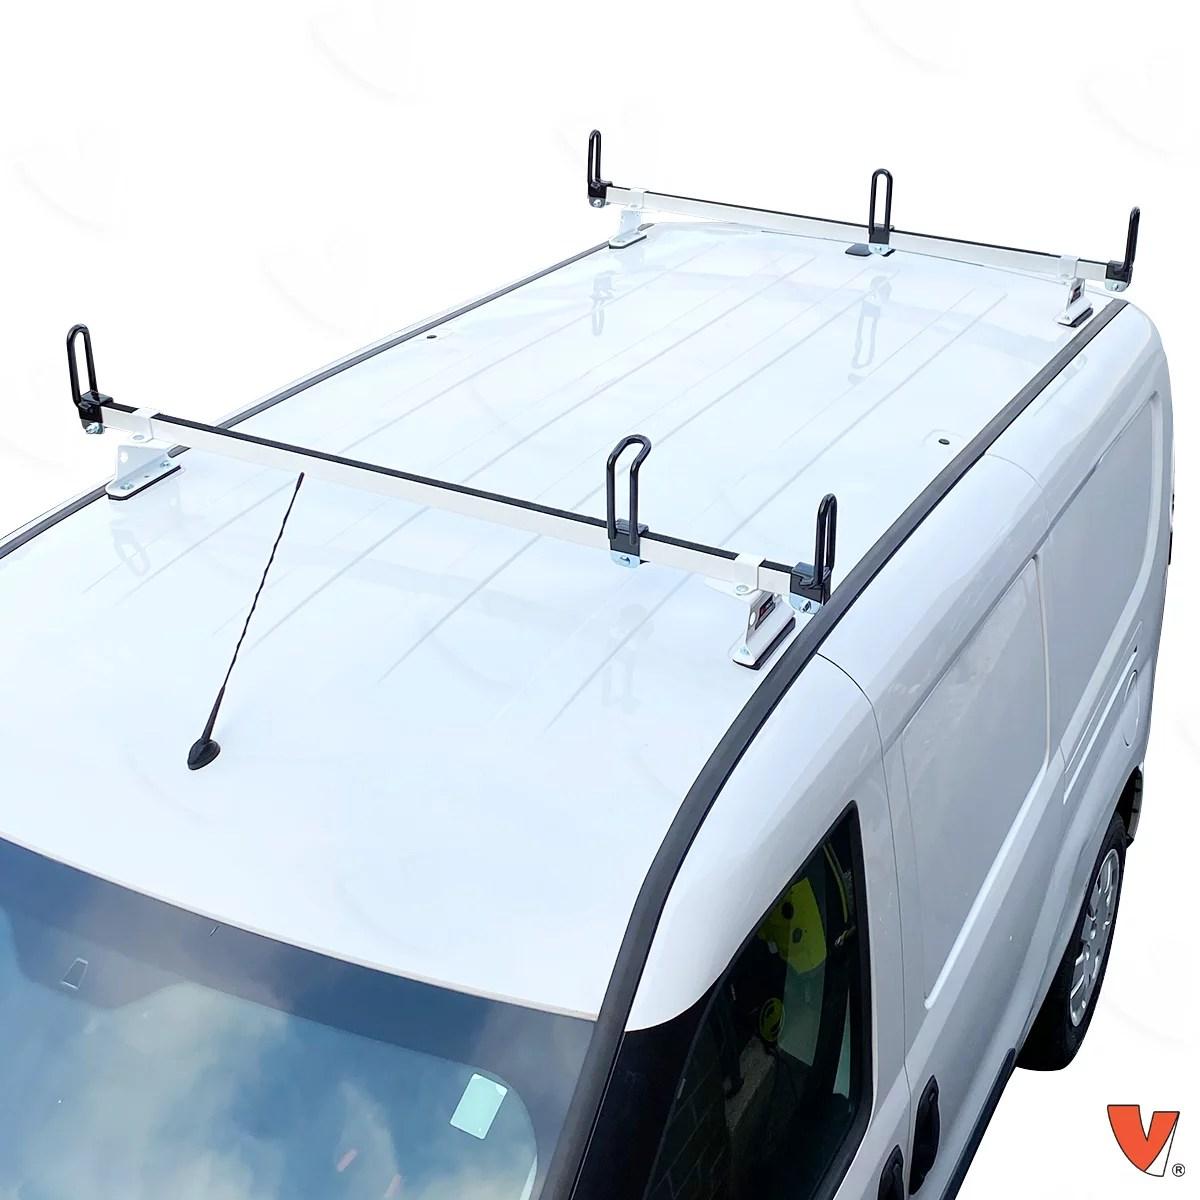 vantech heavy duty 2 bar ladder roof rack fits ram promaster city van white walmart com